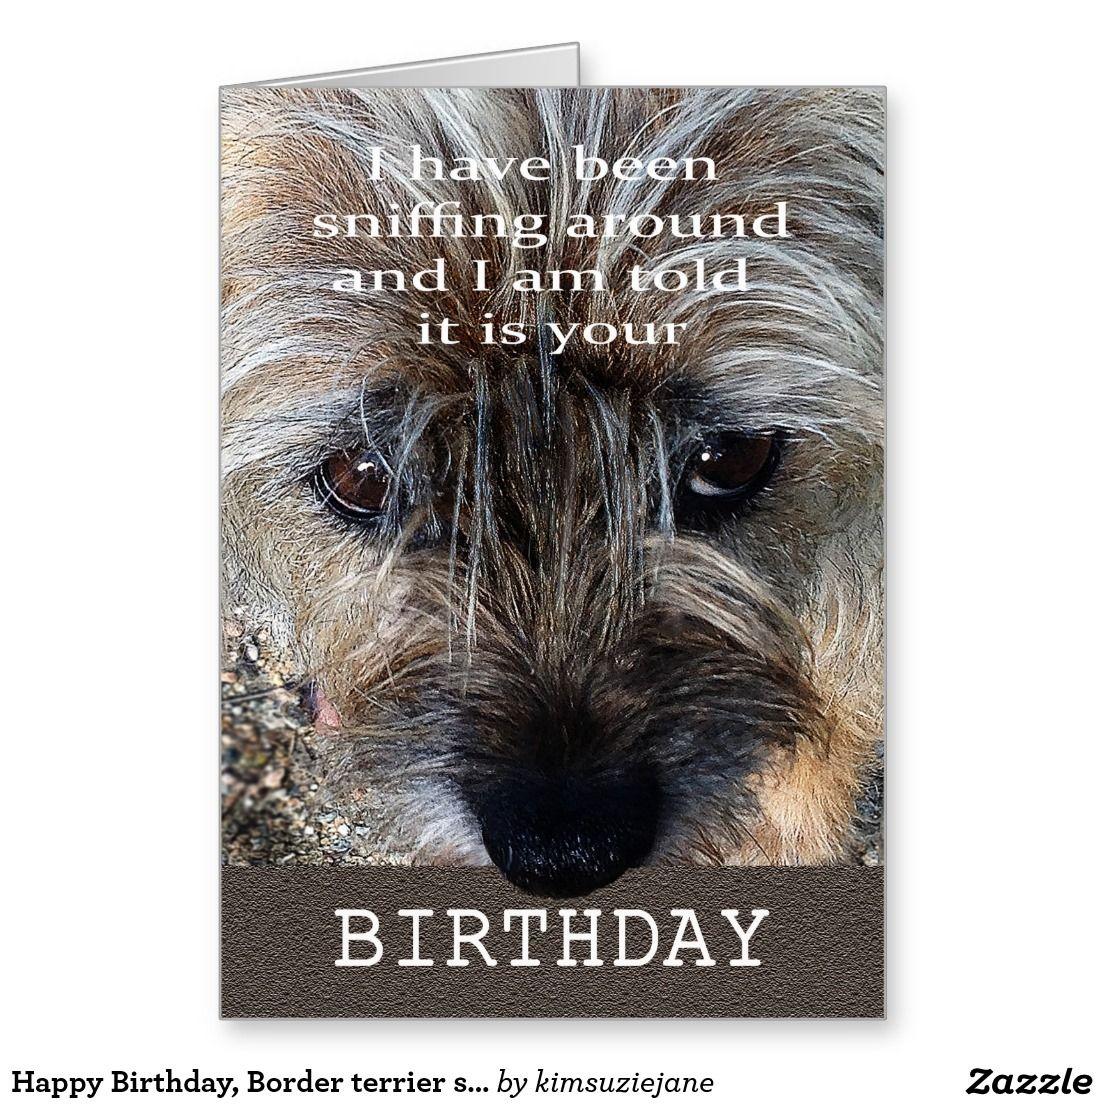 Happy Birthday Border Terrier Sniffing Around Card Zazzle Com Au Border Terrier Terrier Dog Birthday Card